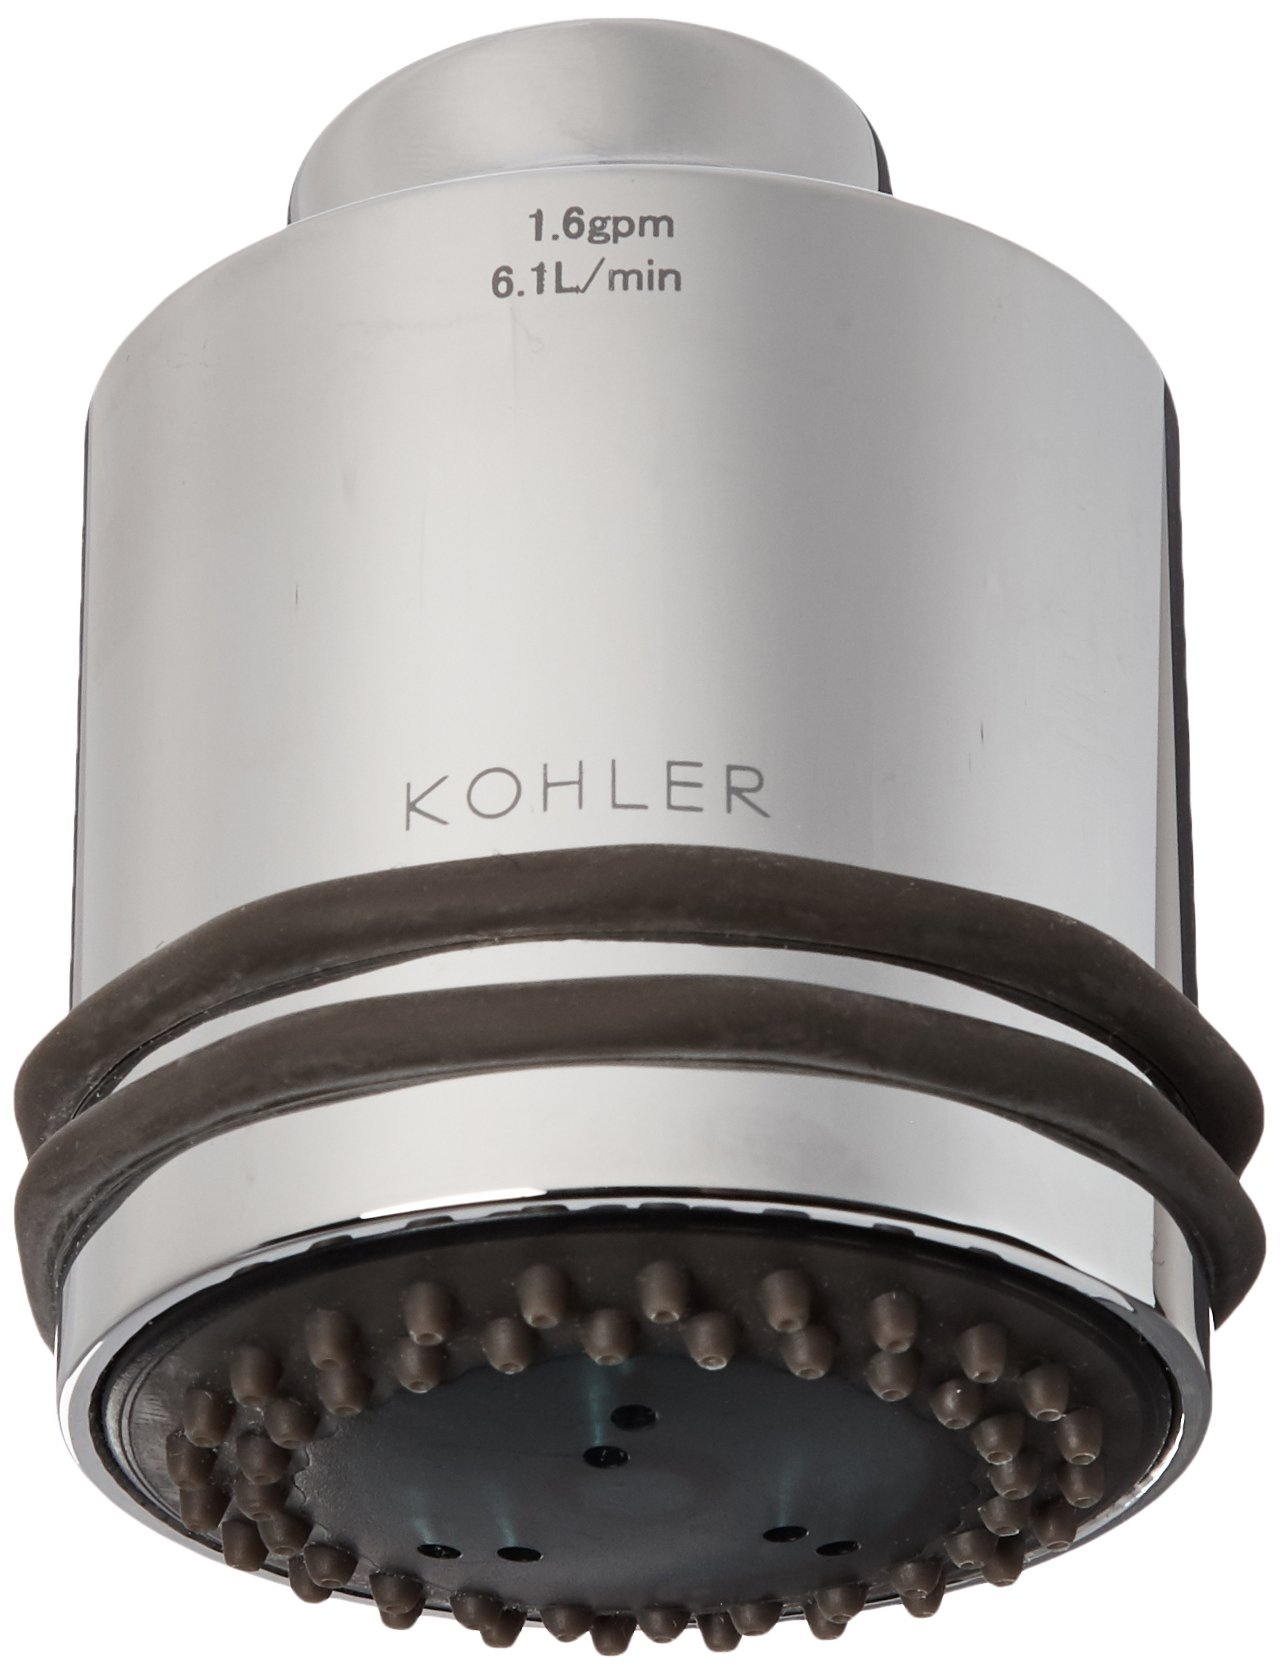 Kohler 86101-CP Body Spray